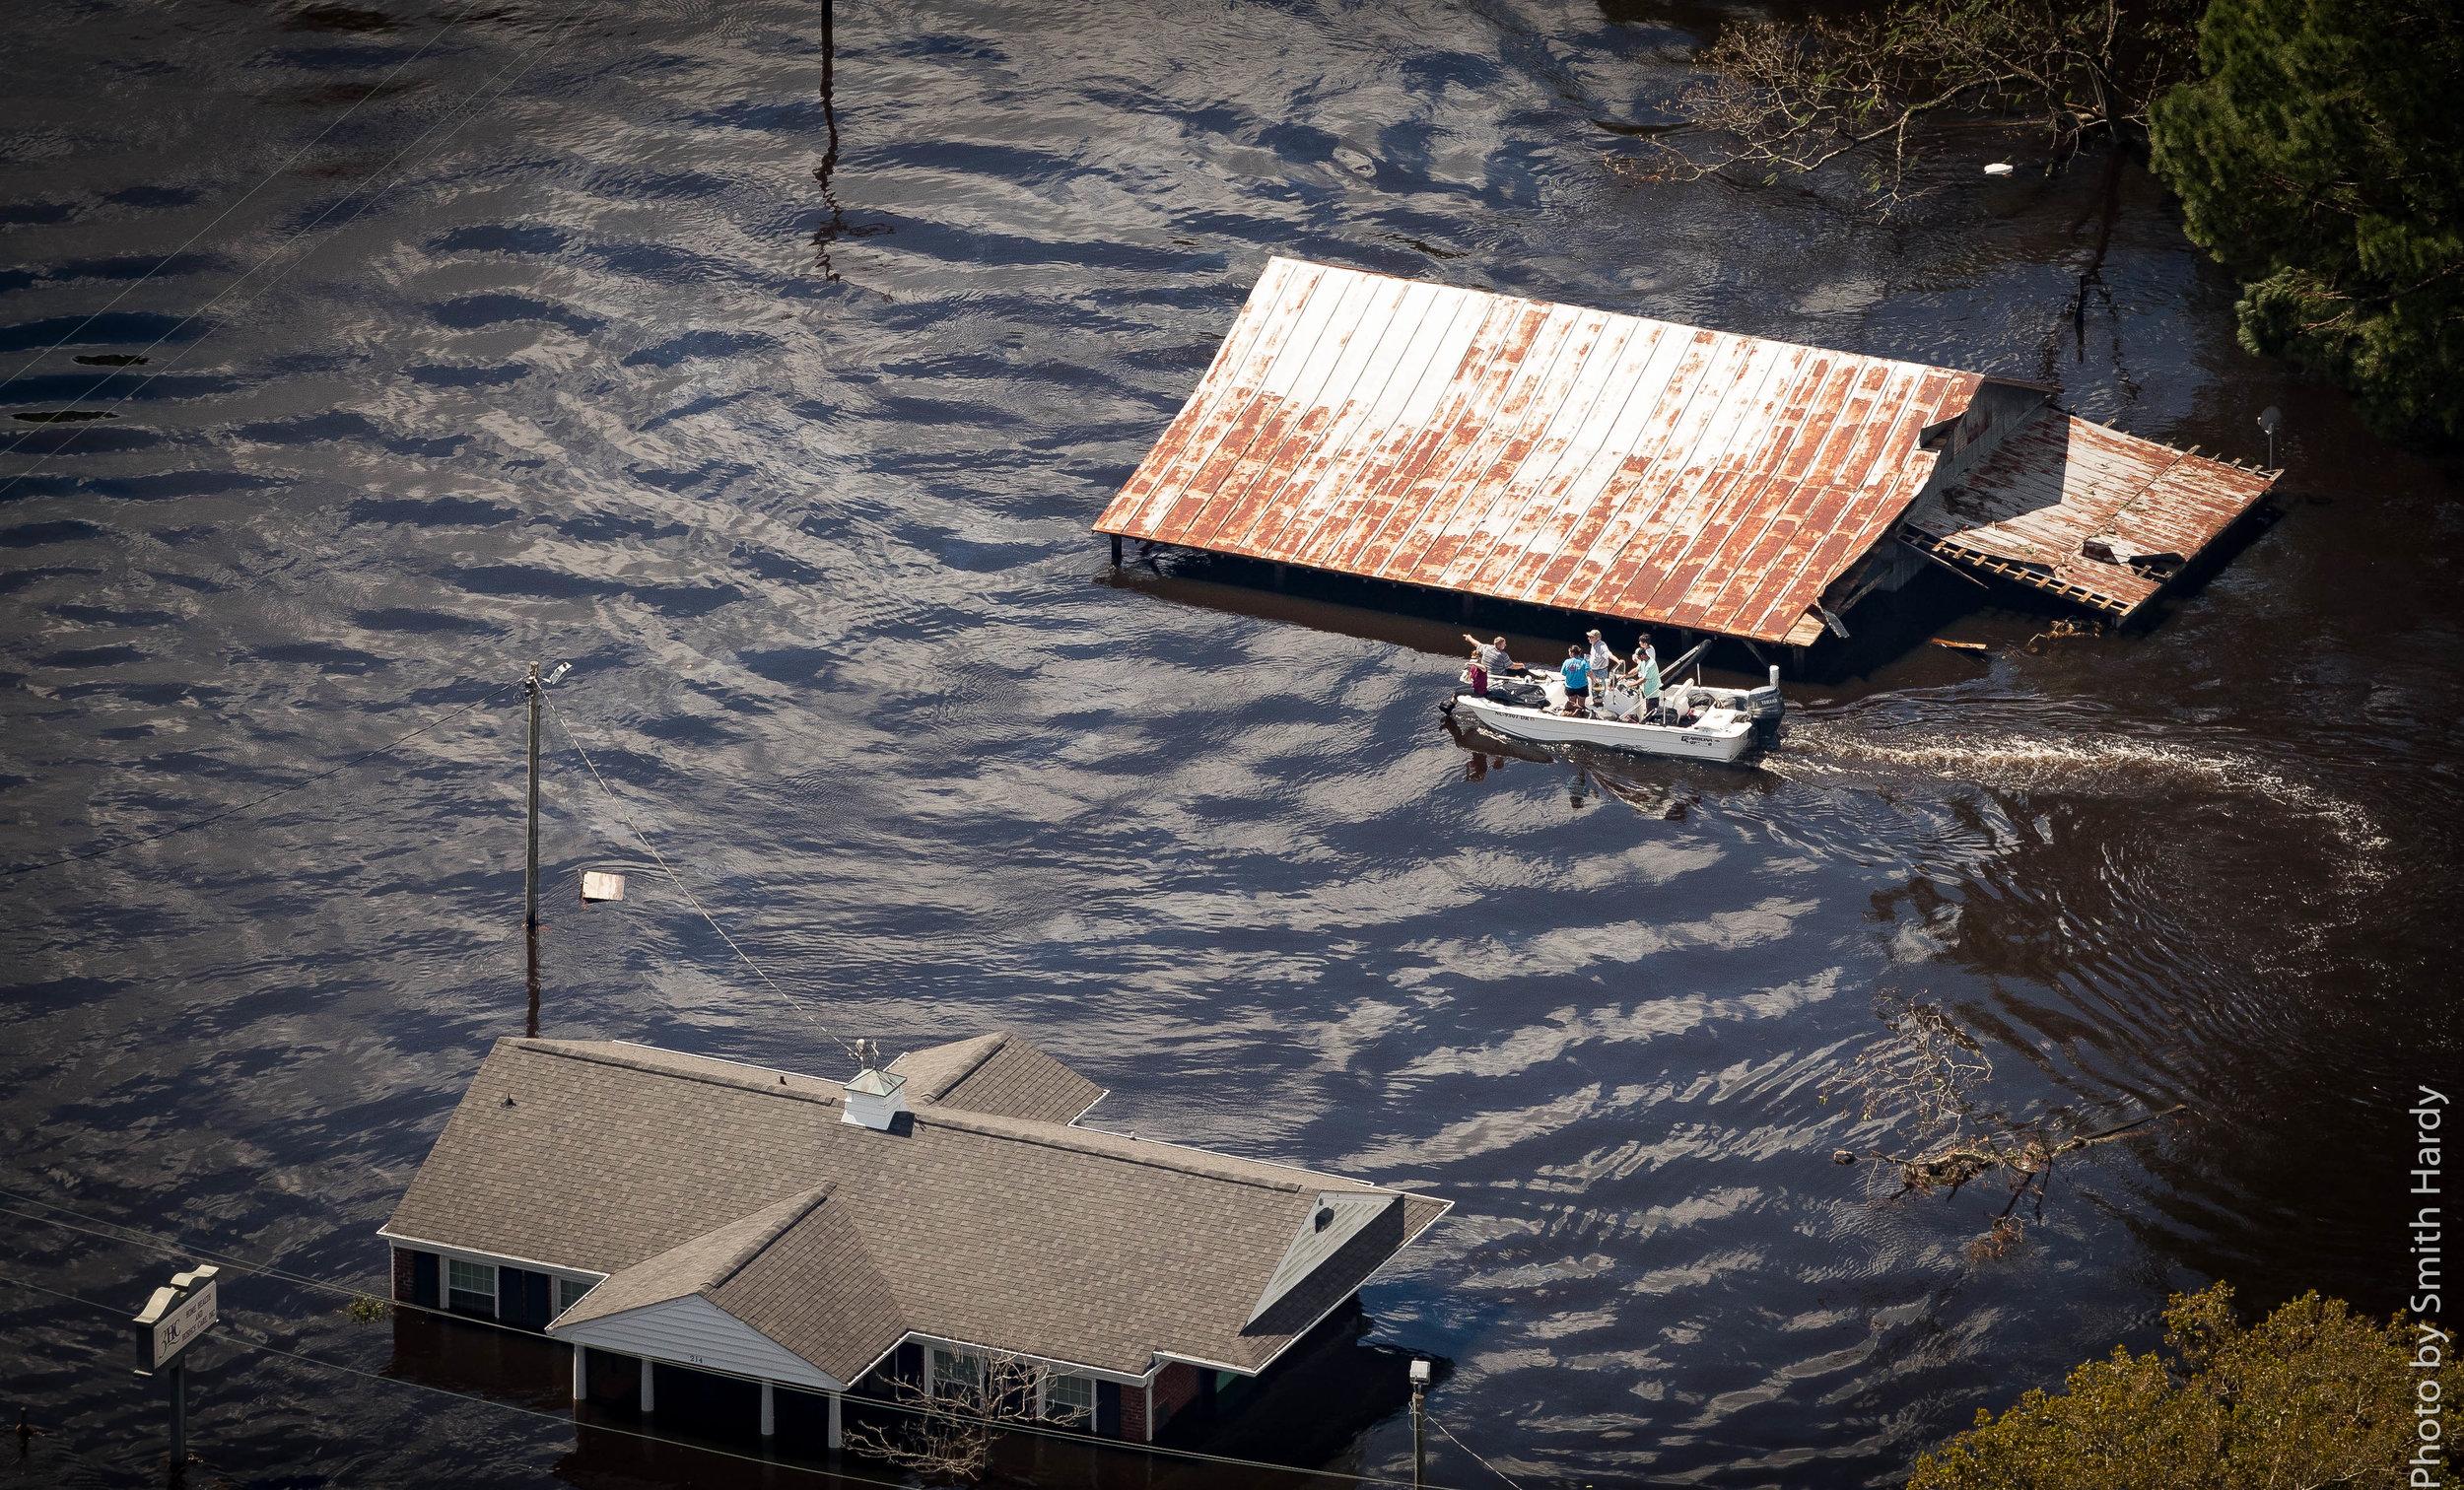 Florence+Floods+and+Beach+(19+of+52).jpg